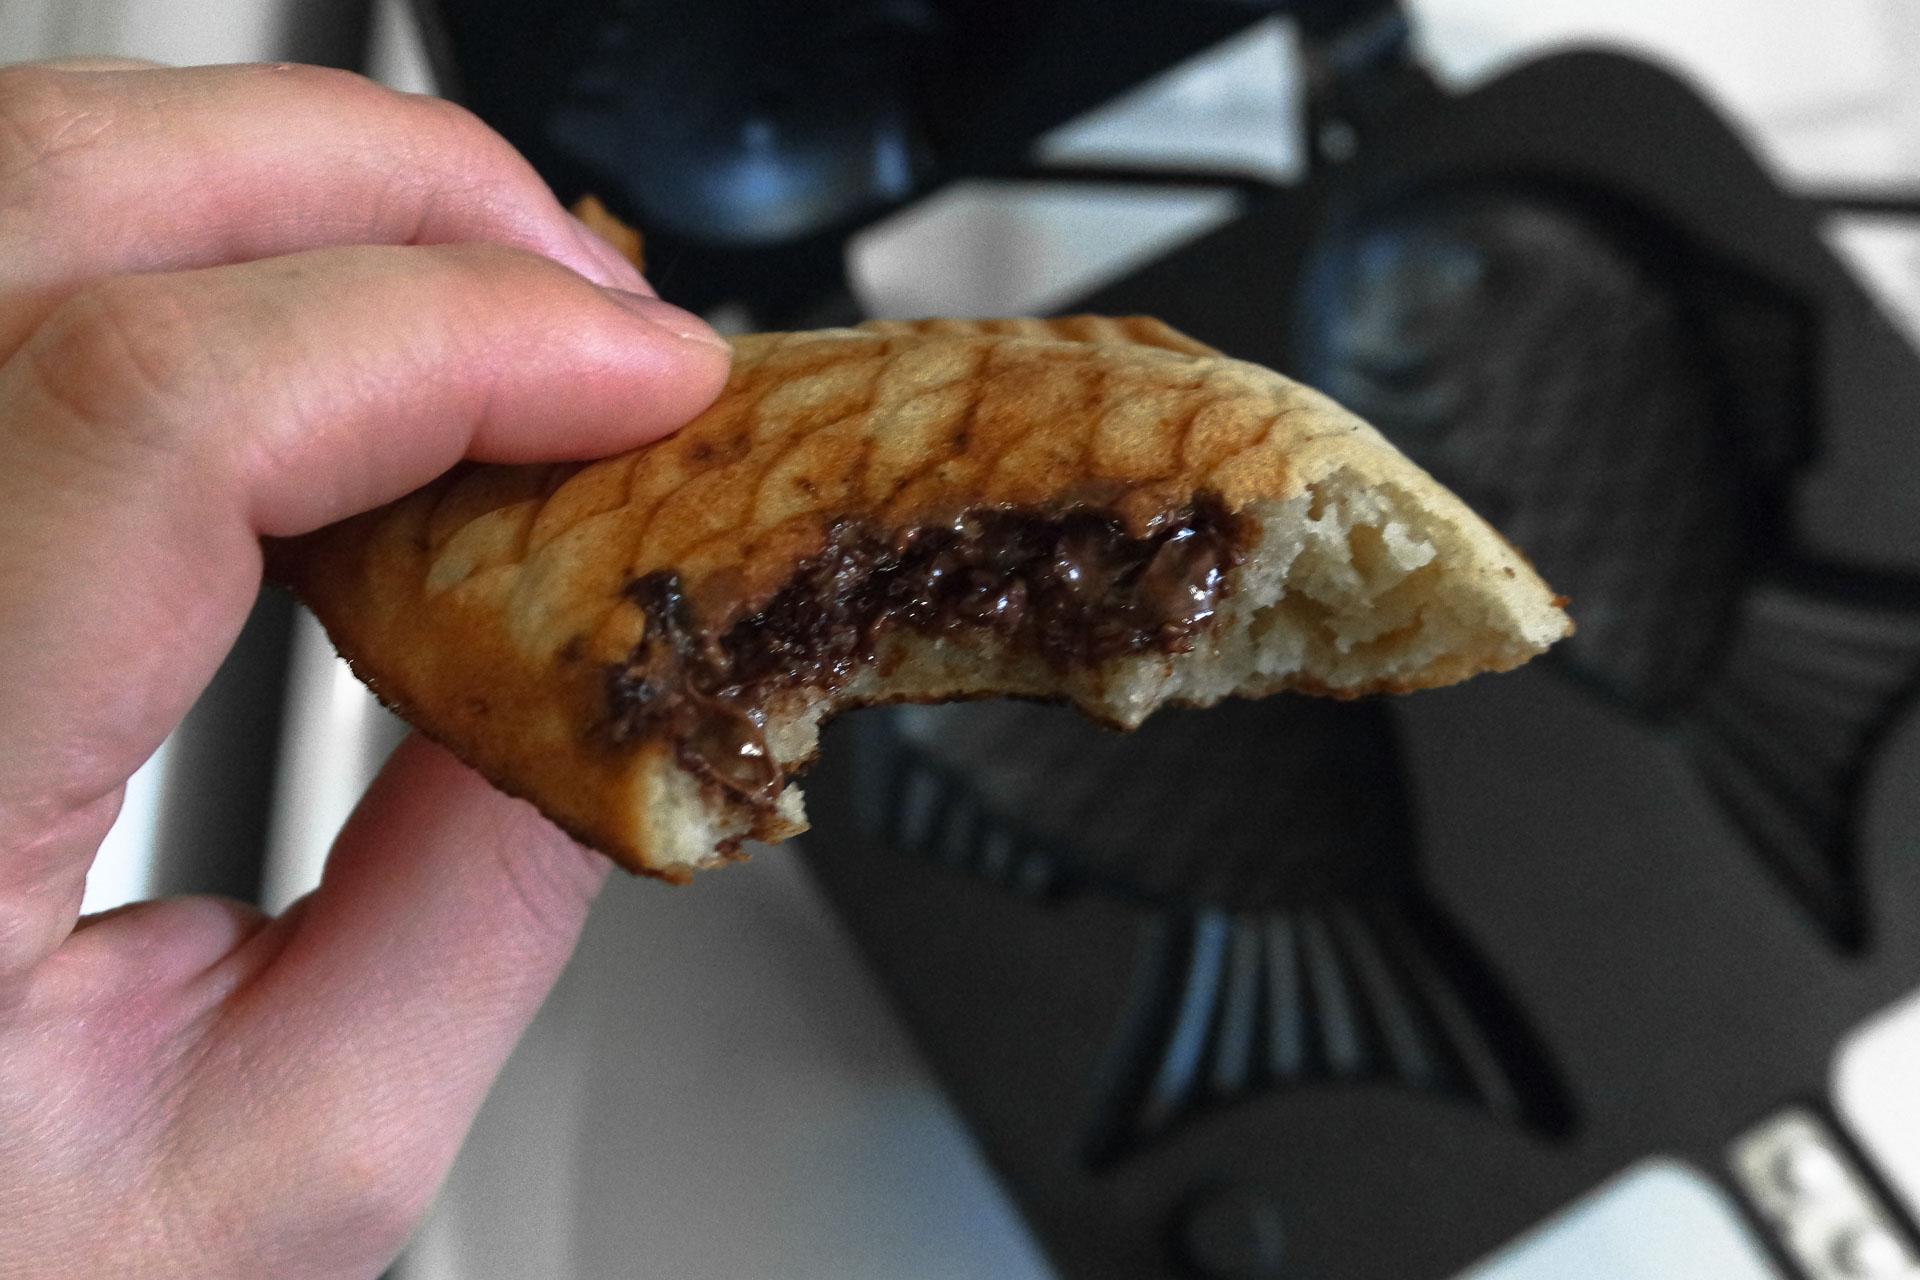 Recette des taiyaki, fourrage au chocolat